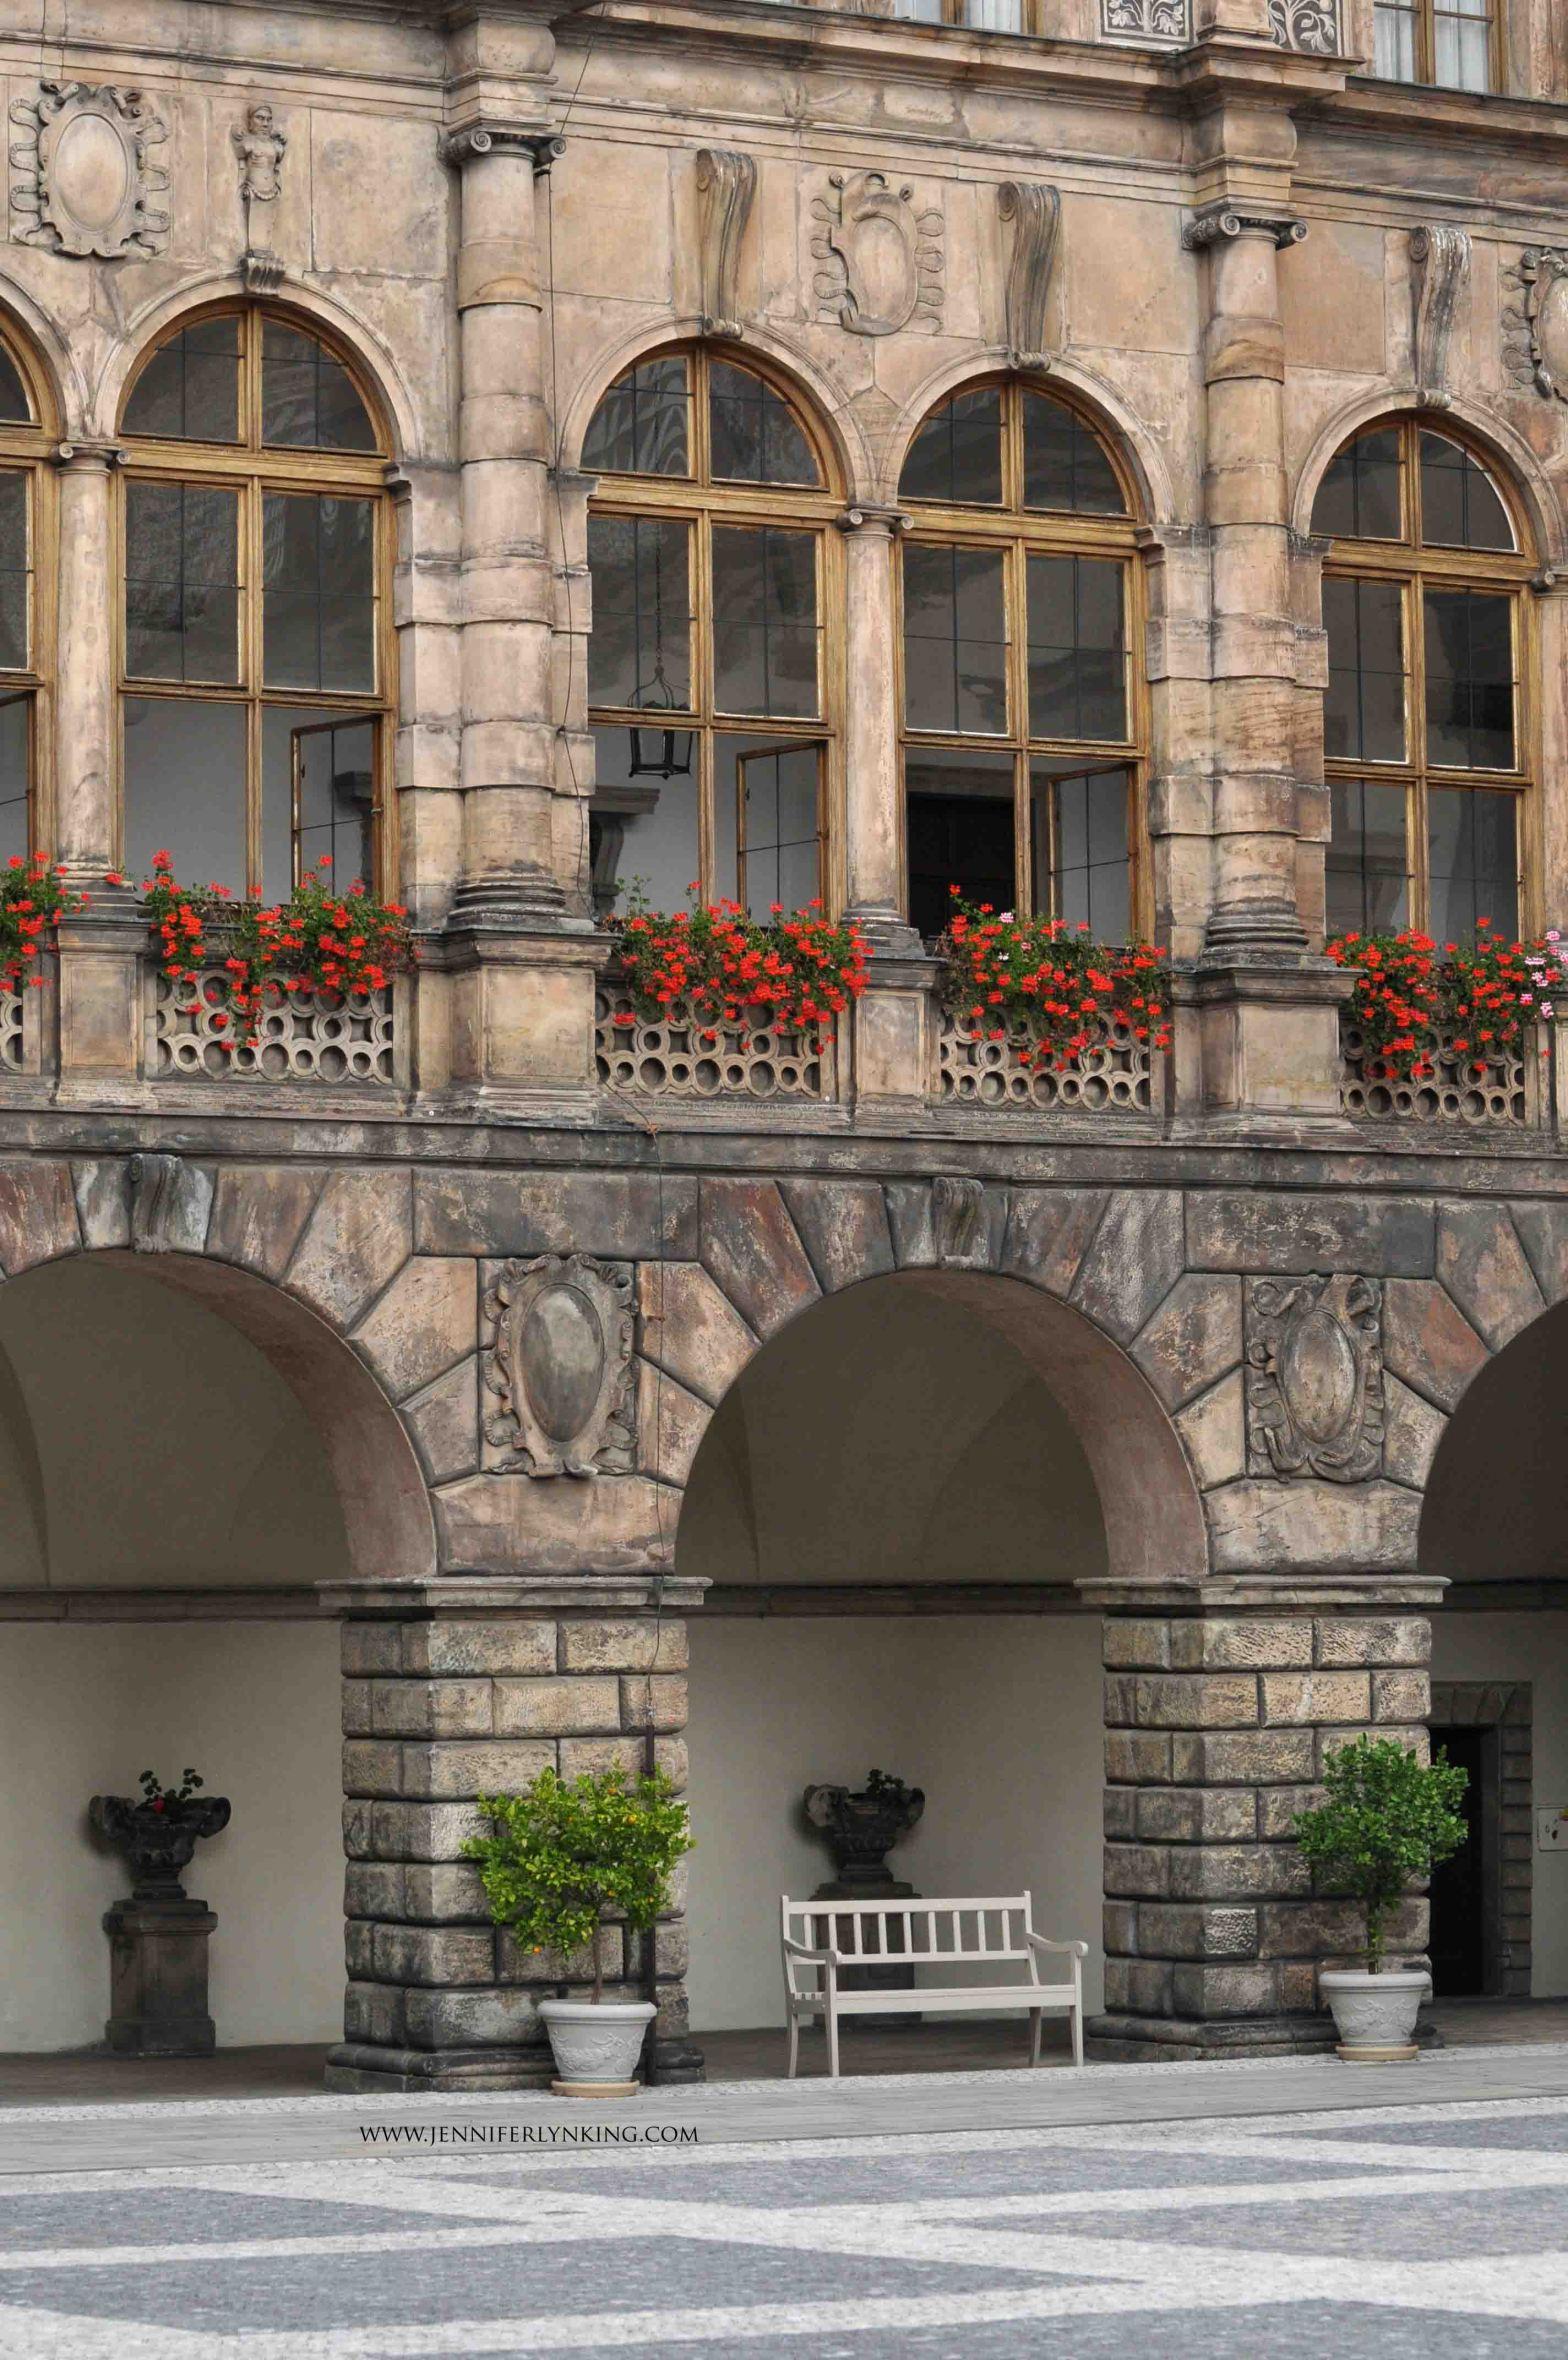 the beautiful courtyard surroundings, Nelahozeves Castle, Czech Republic